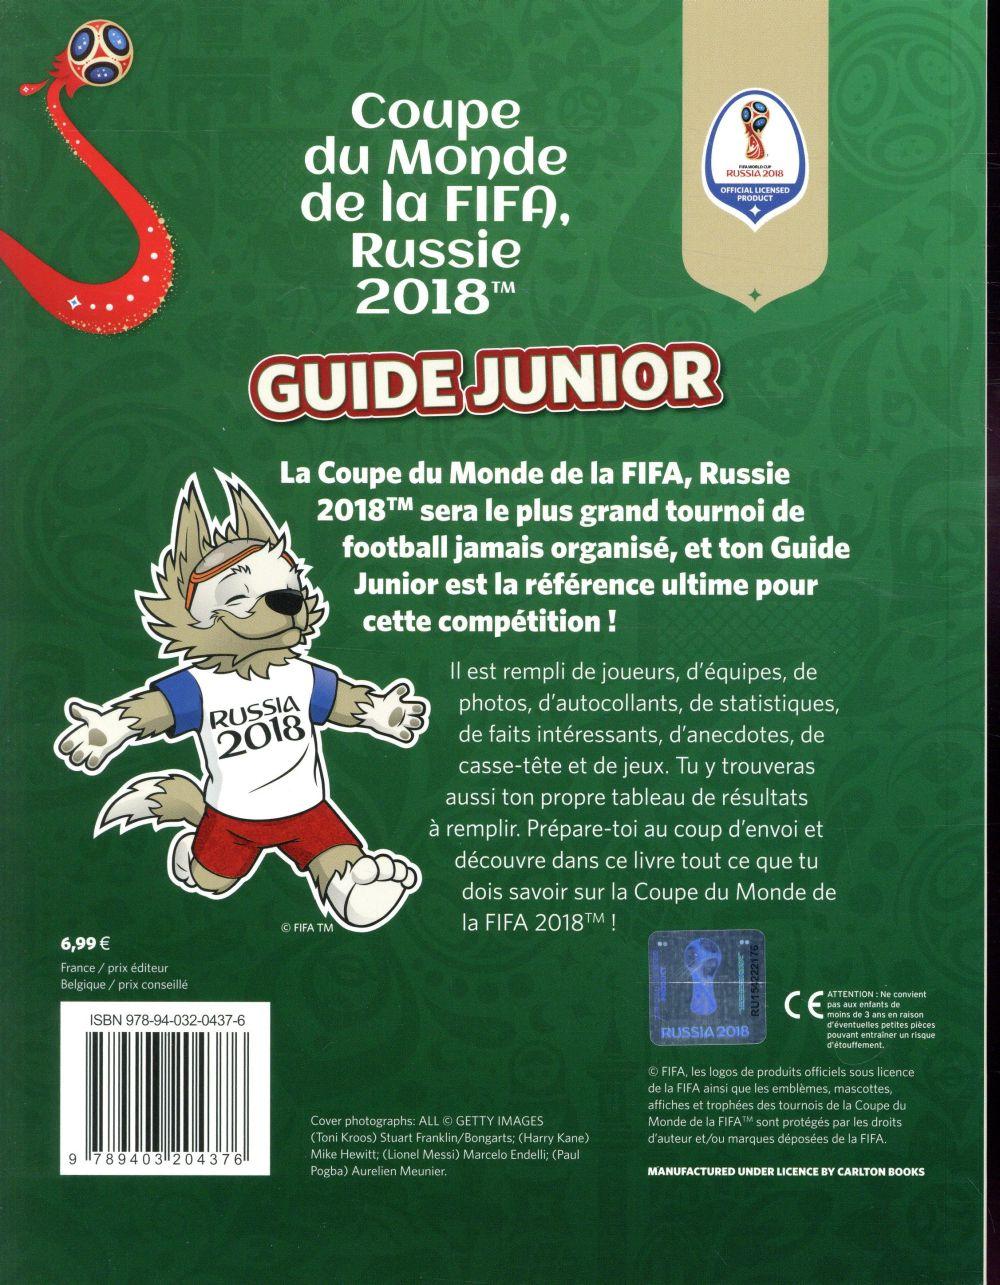 fifa coupe du monde 2018 :  guide junior